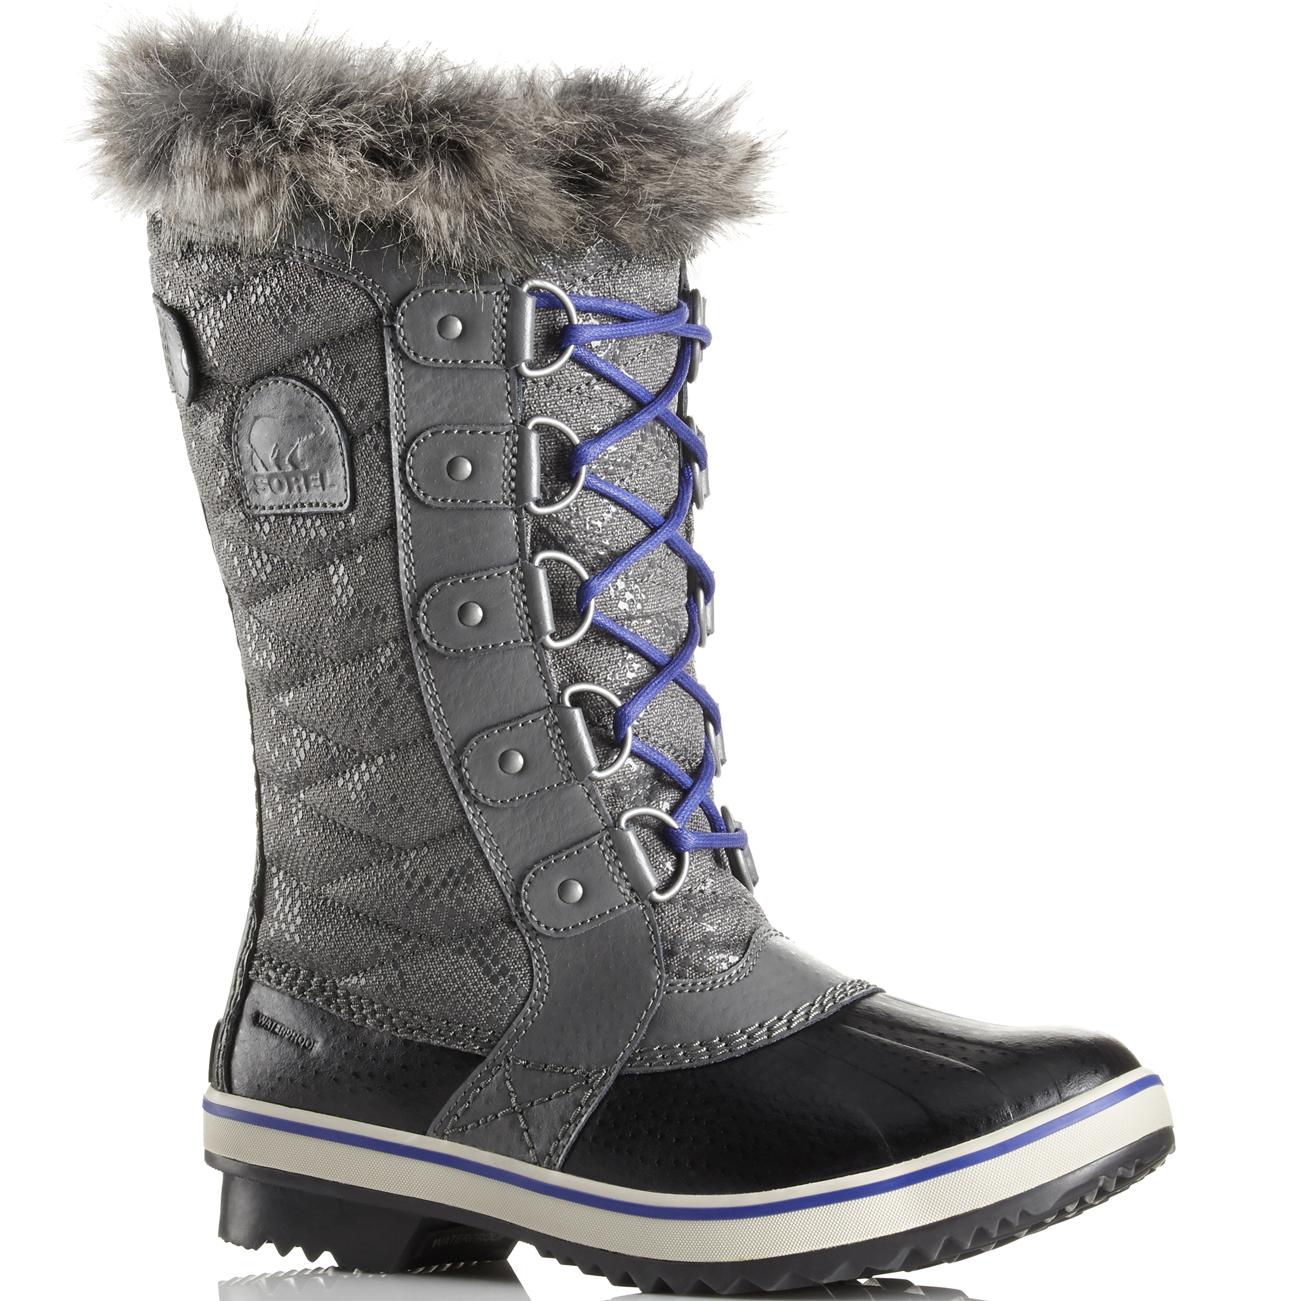 Womens Sorel Tofino II Mid Calf Waterproof Winter Walking ...